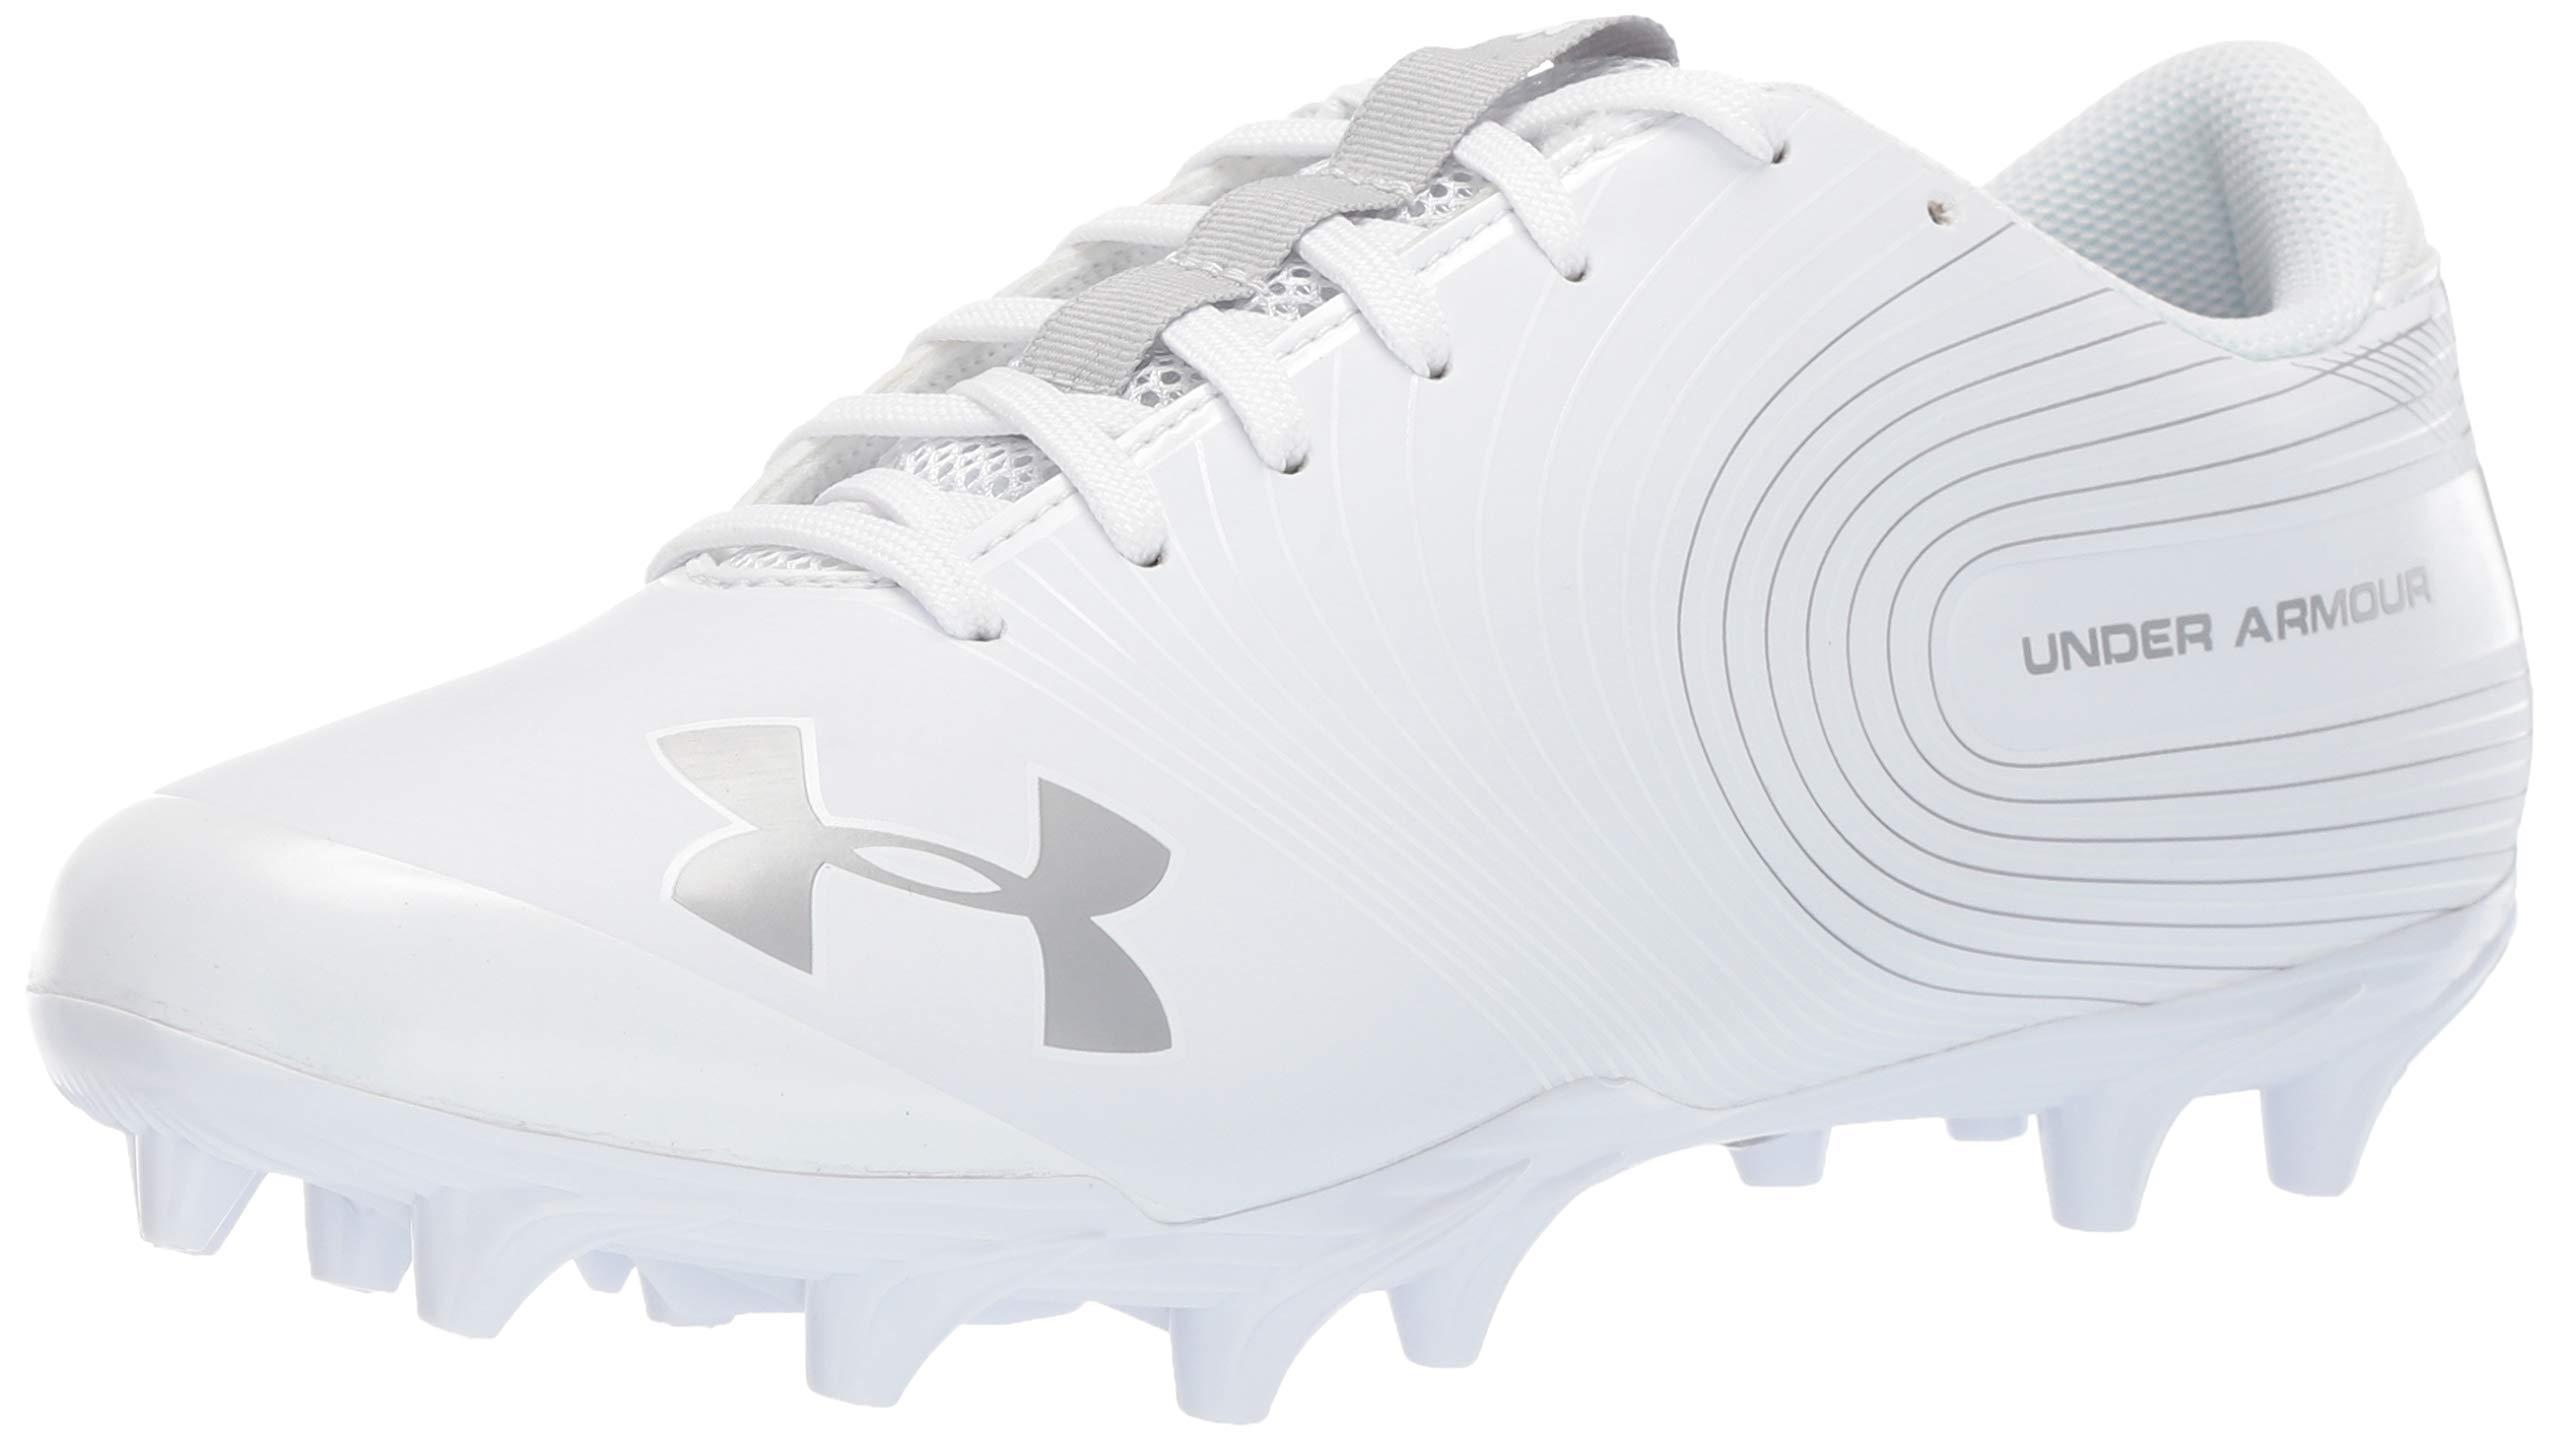 Under Armour Men's Speed Phantom MC Football Shoe, White/White, 7.5 M US by Under Armour (Image #1)